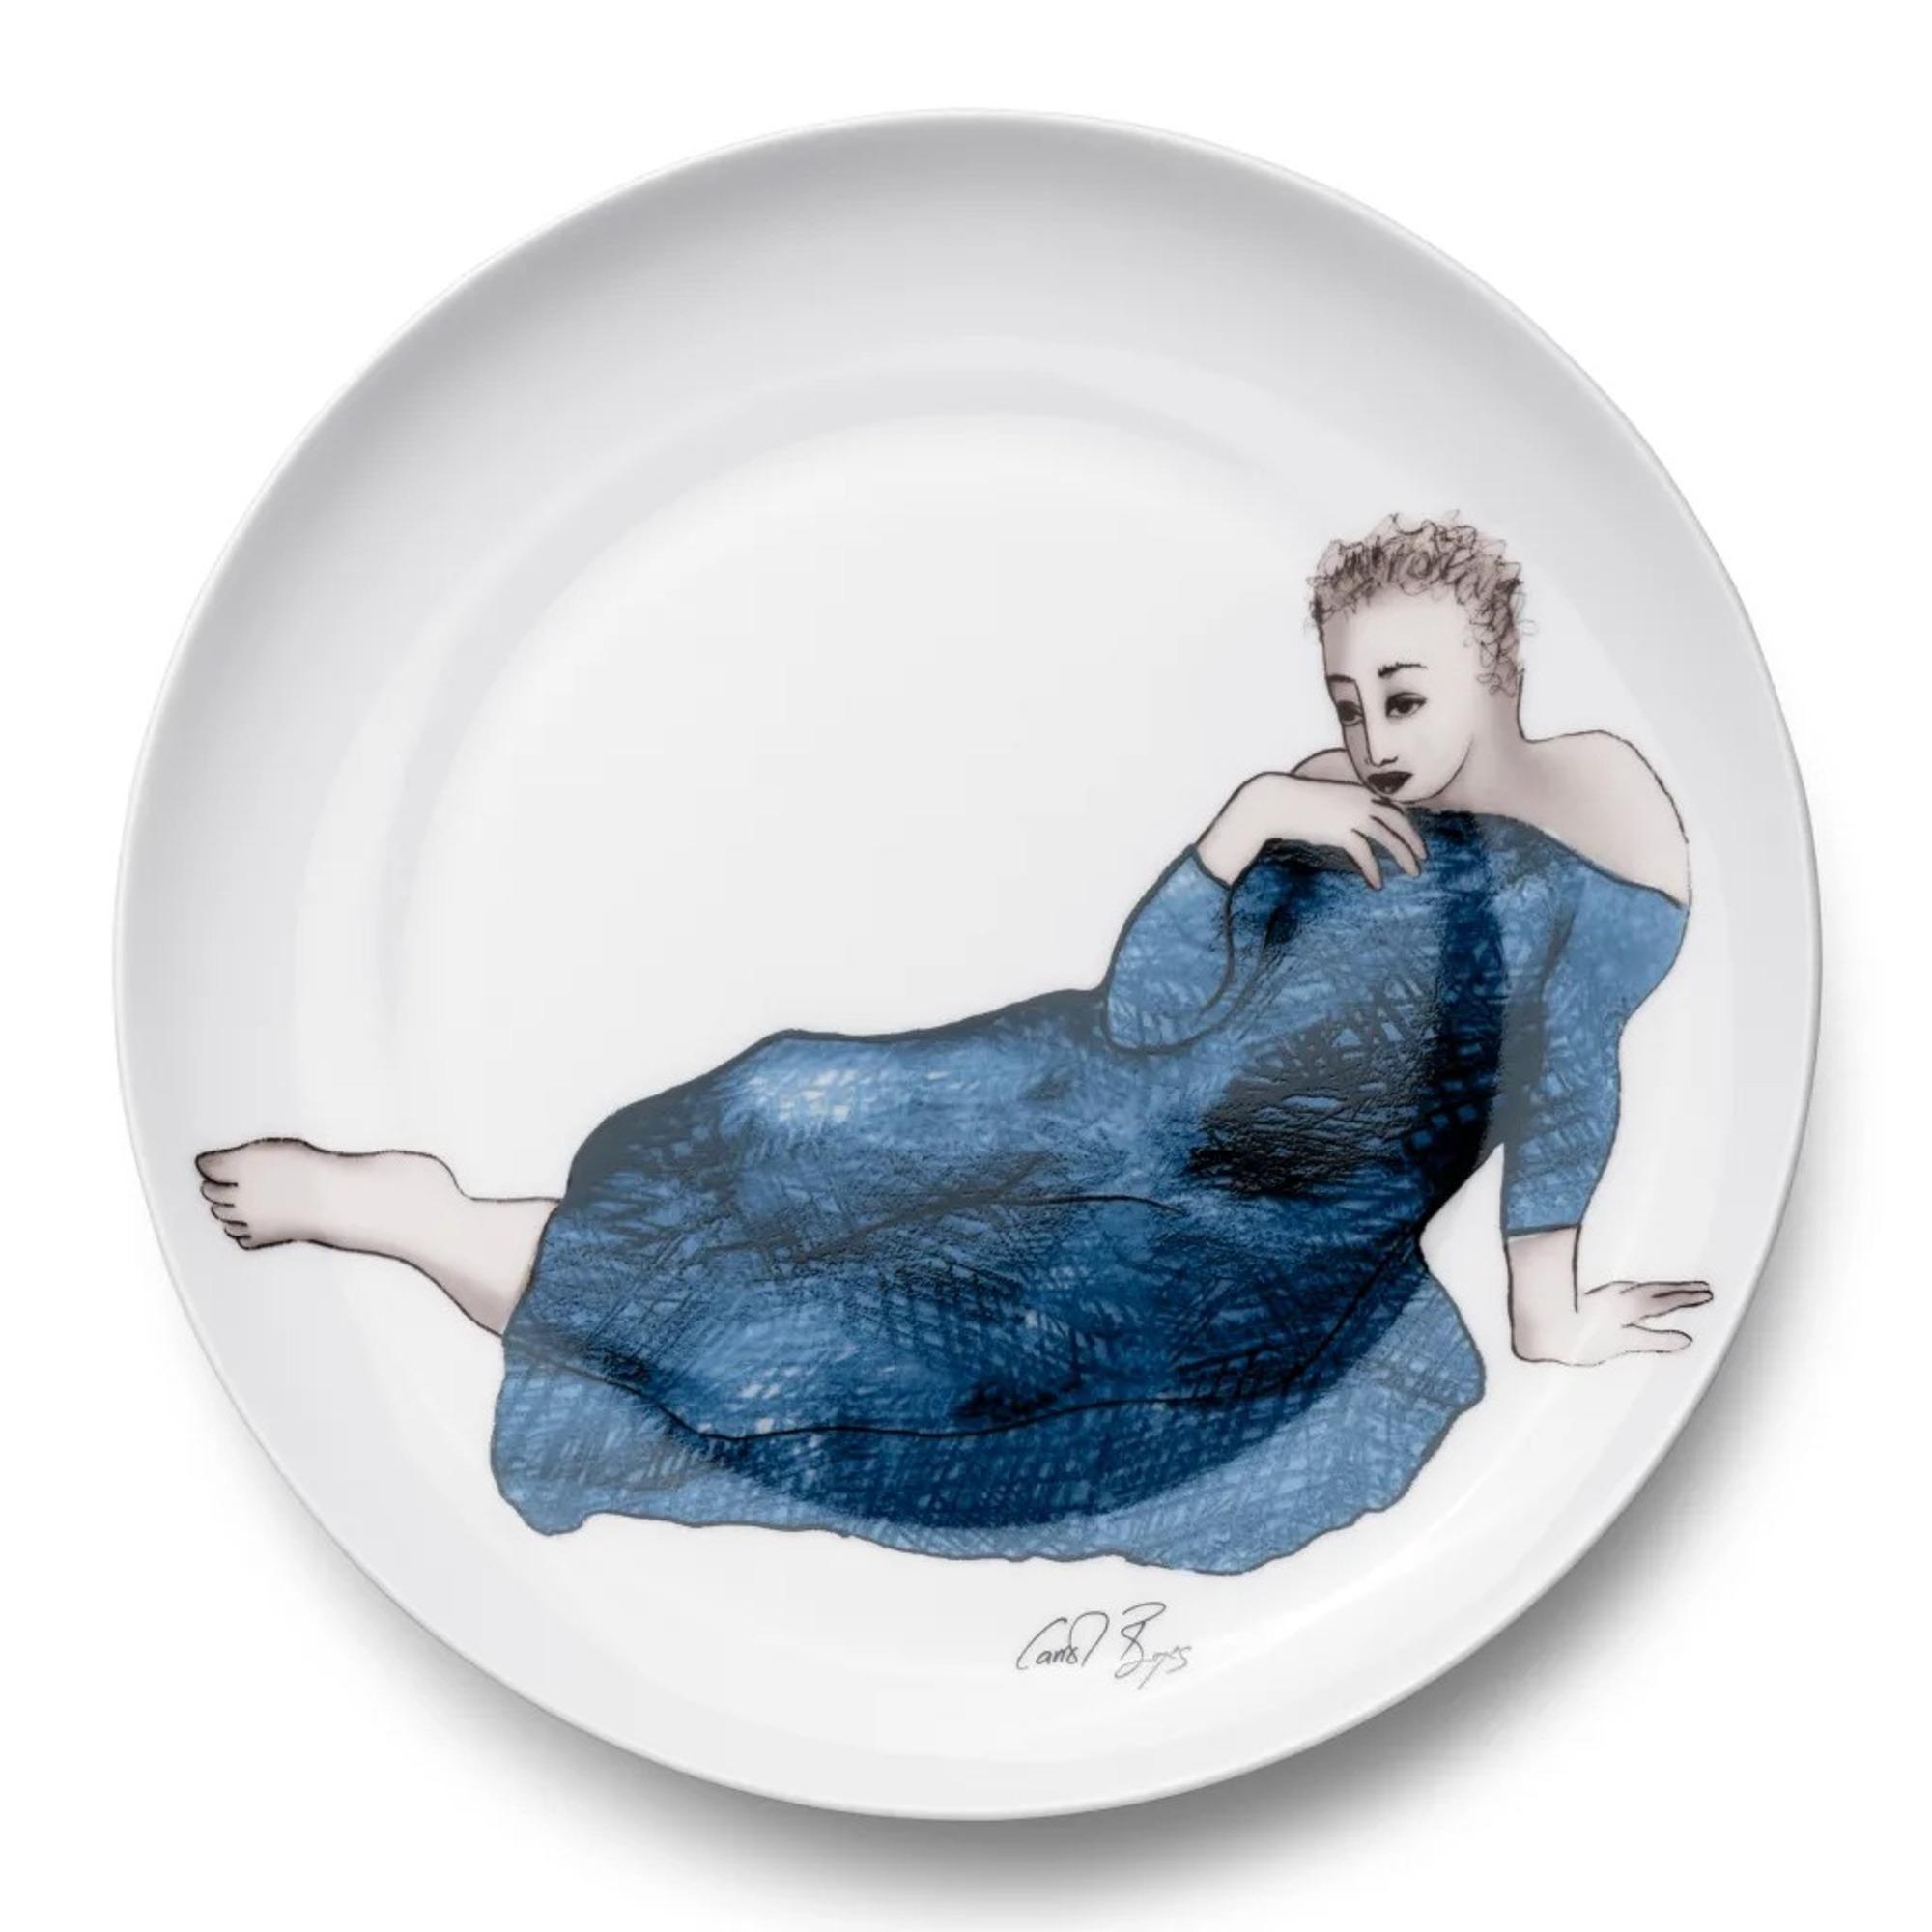 Carrol Boyes Dinner Plate Enticing Set of 4